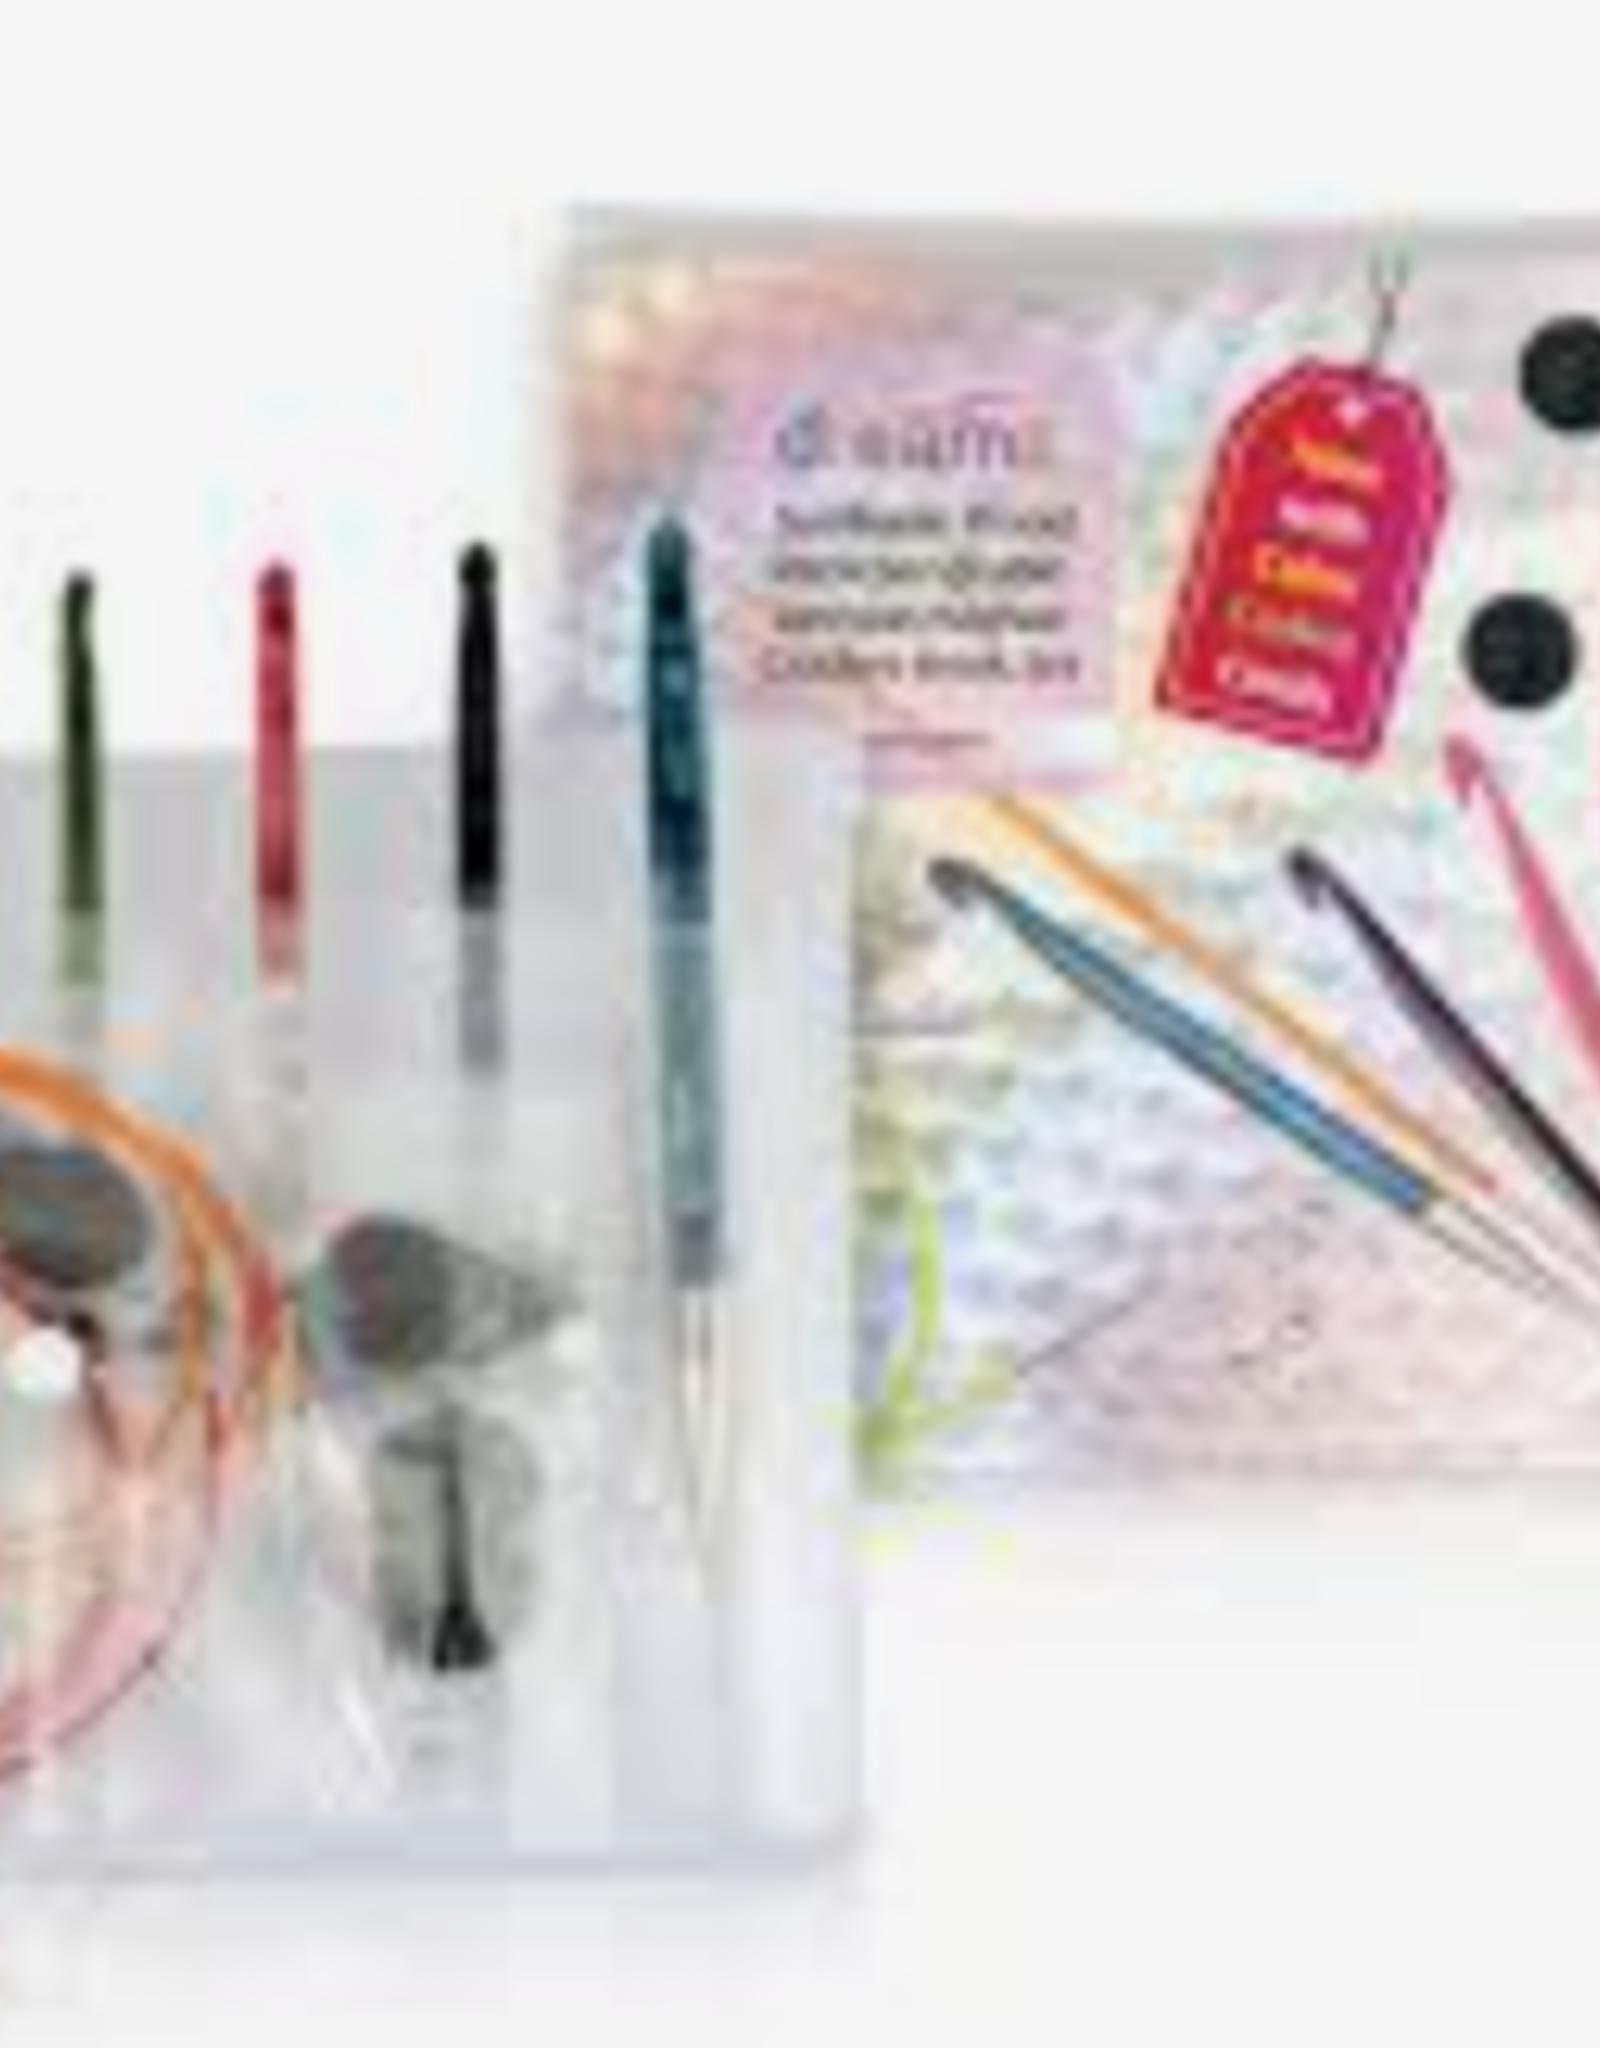 Knitter's Pride Dreamz Tunisian IC Hook Set